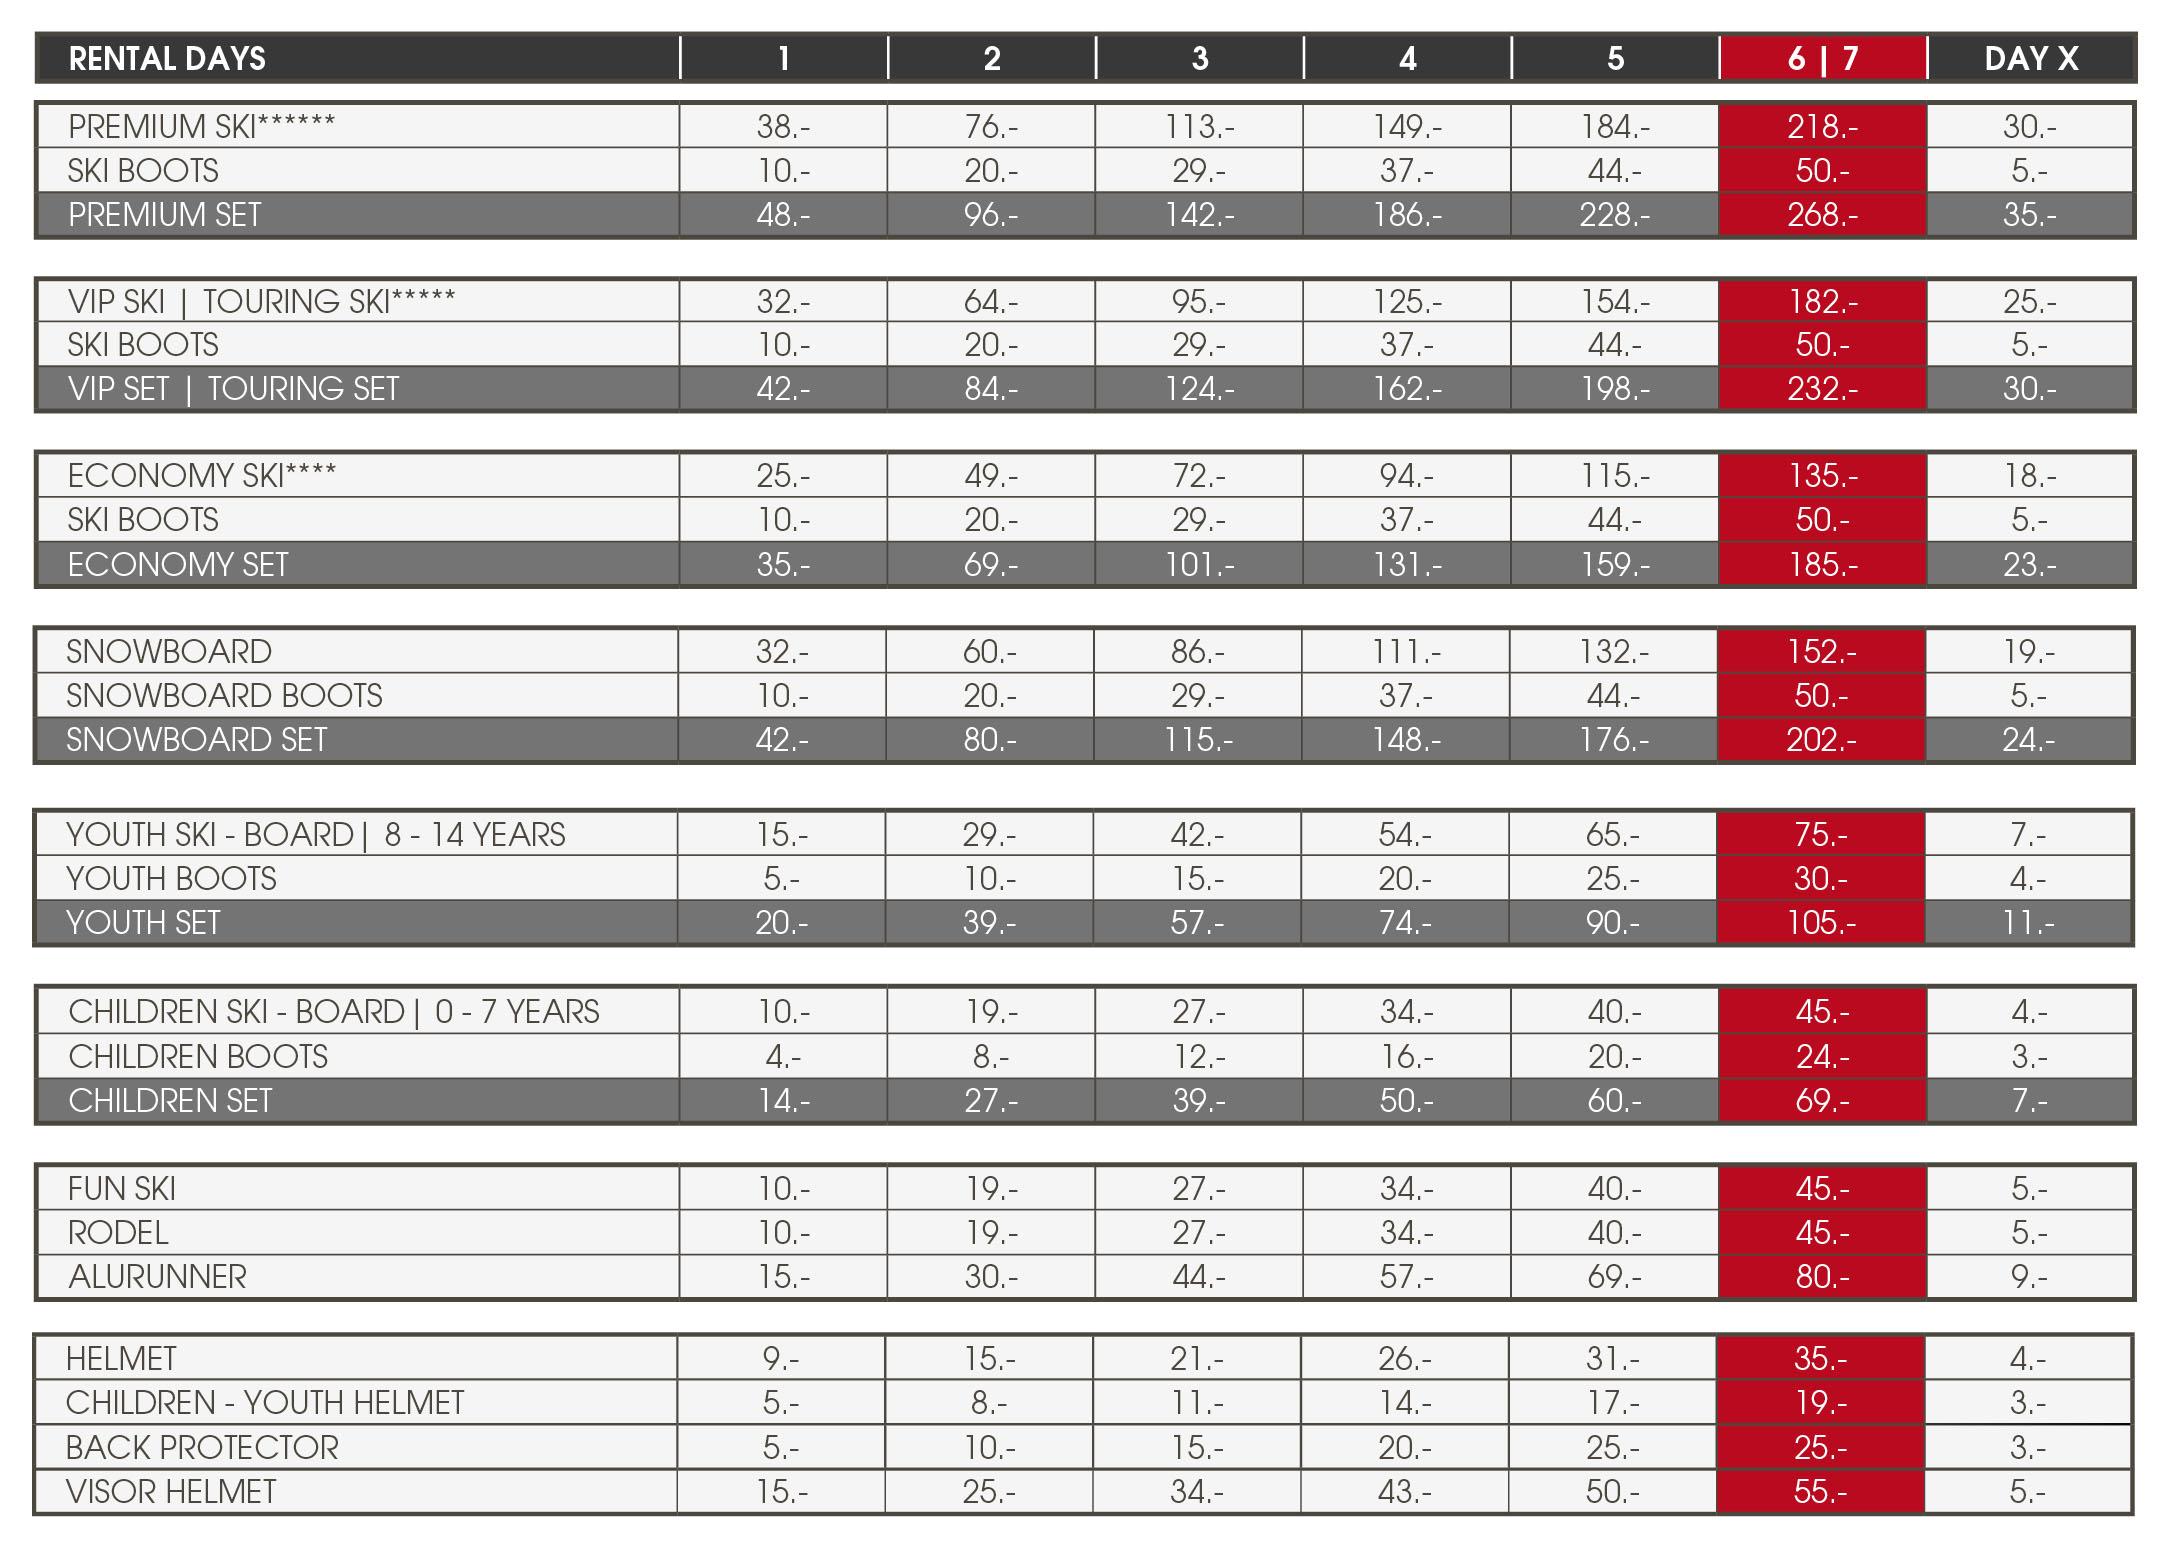 Preisliste-rent-sport-skiverleih-2016-ohne-halbtage-neu1